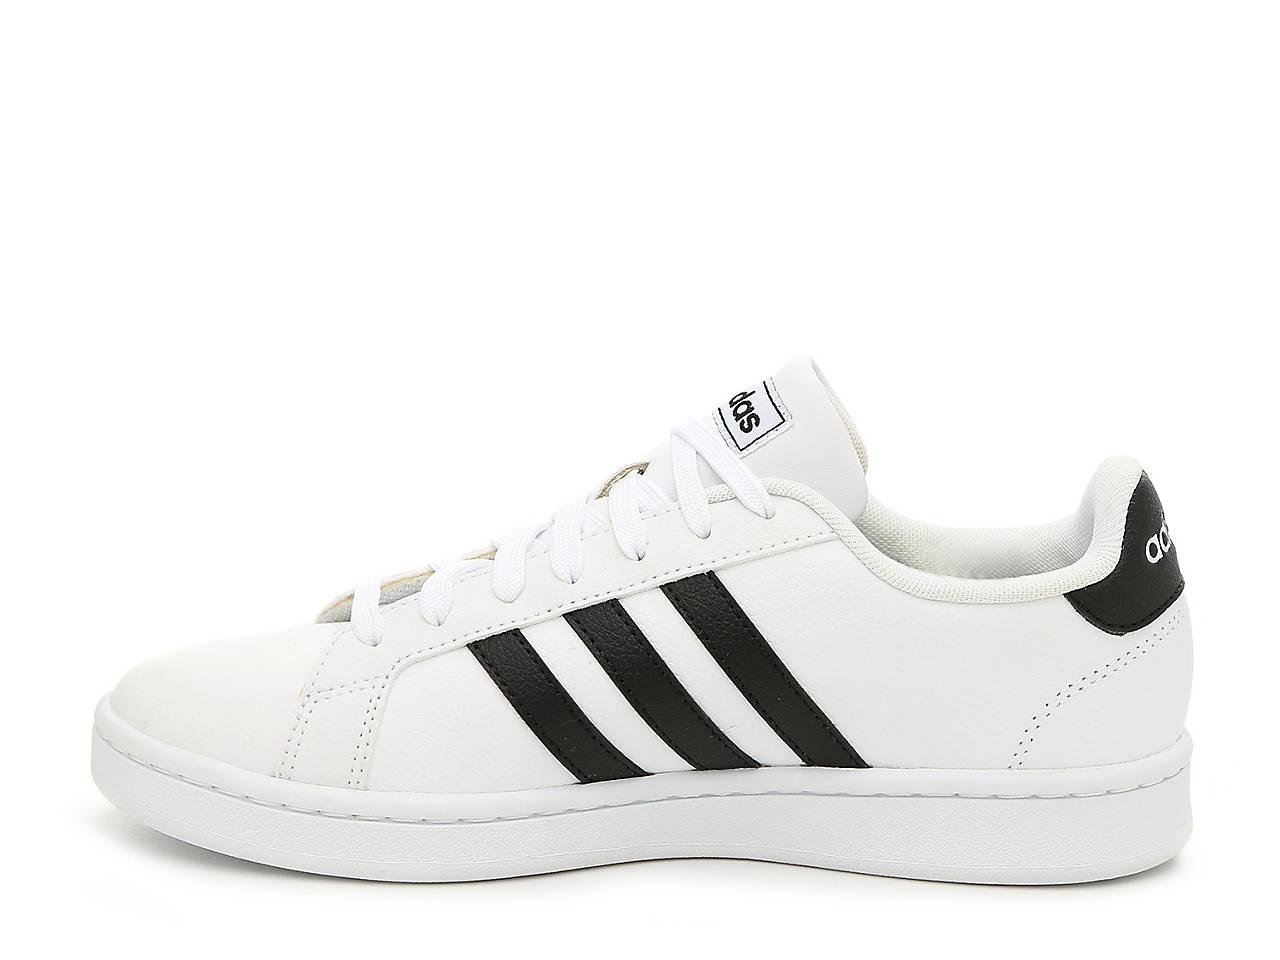 157f49162 adidas Grand Court Sneaker - Women s Women s Shoes